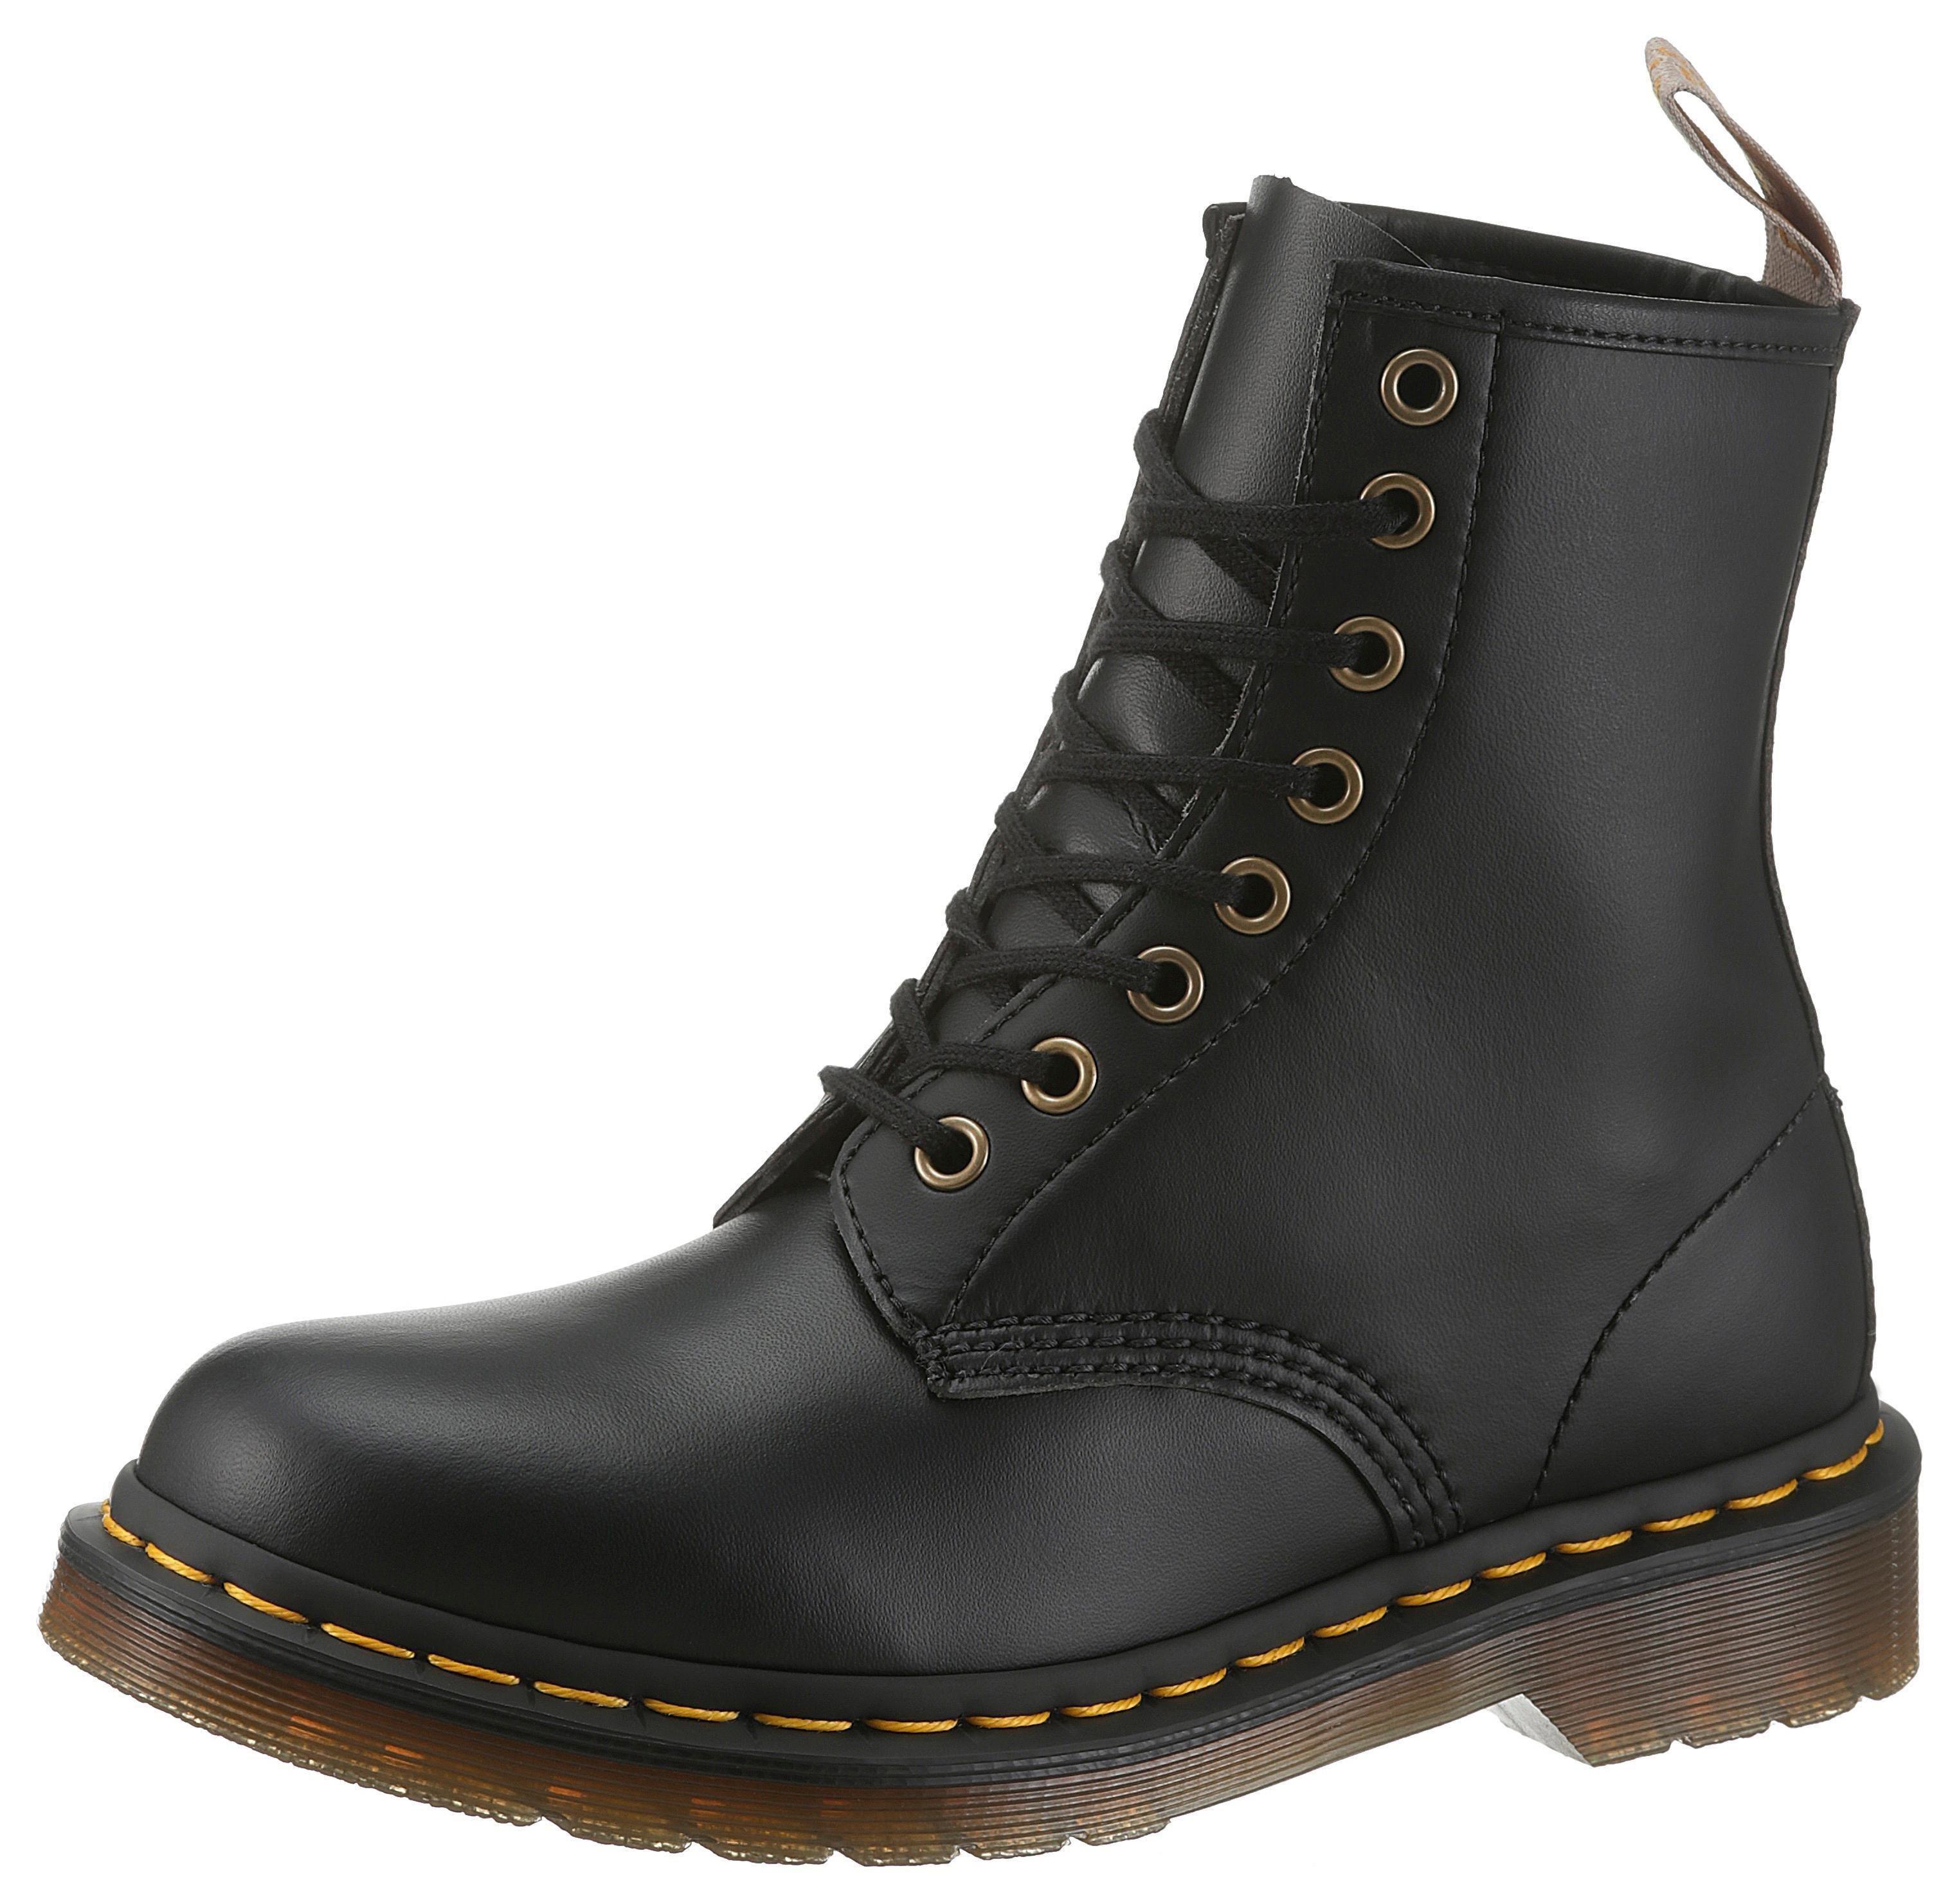 imwalking #DRMARTENS #Boots #Schnürboots #Schuhe #Stiefel